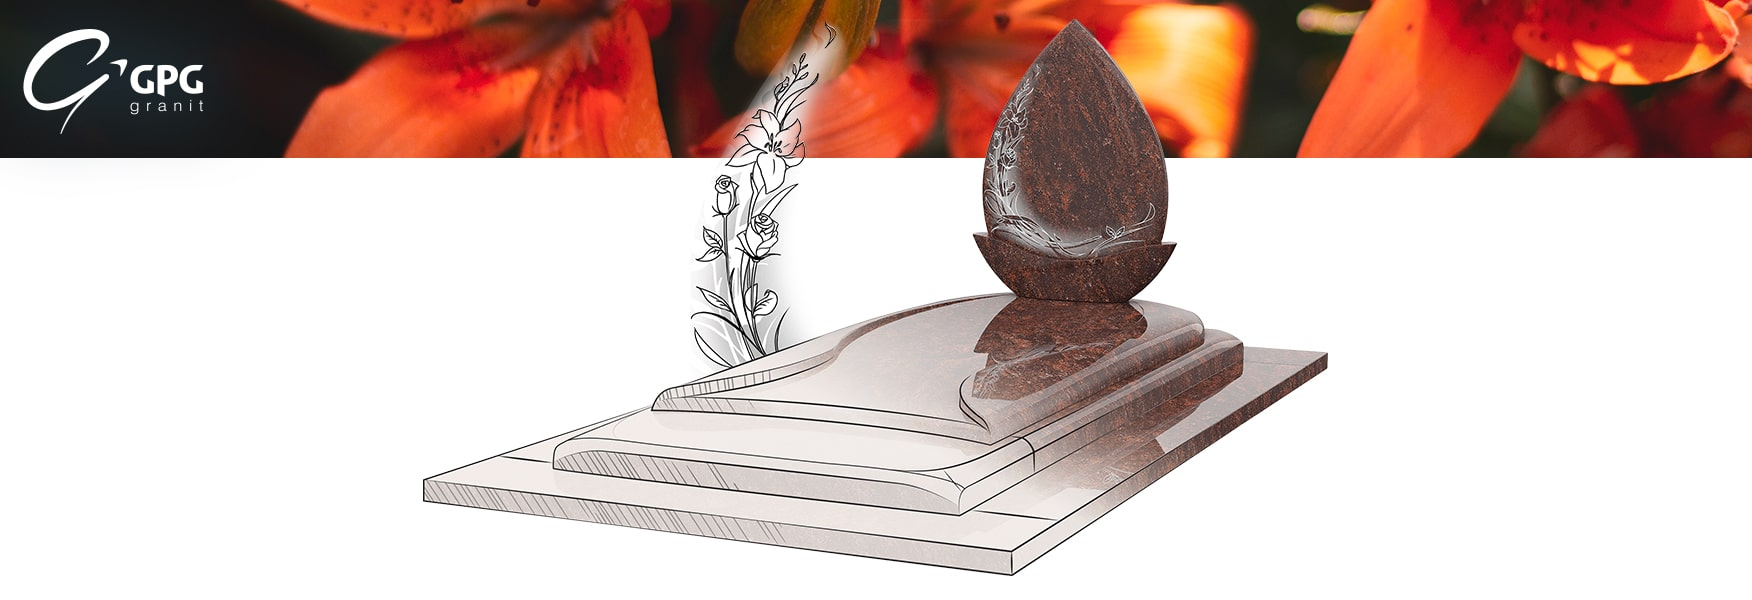 Monument funéraire GPG 291 en granit Salina